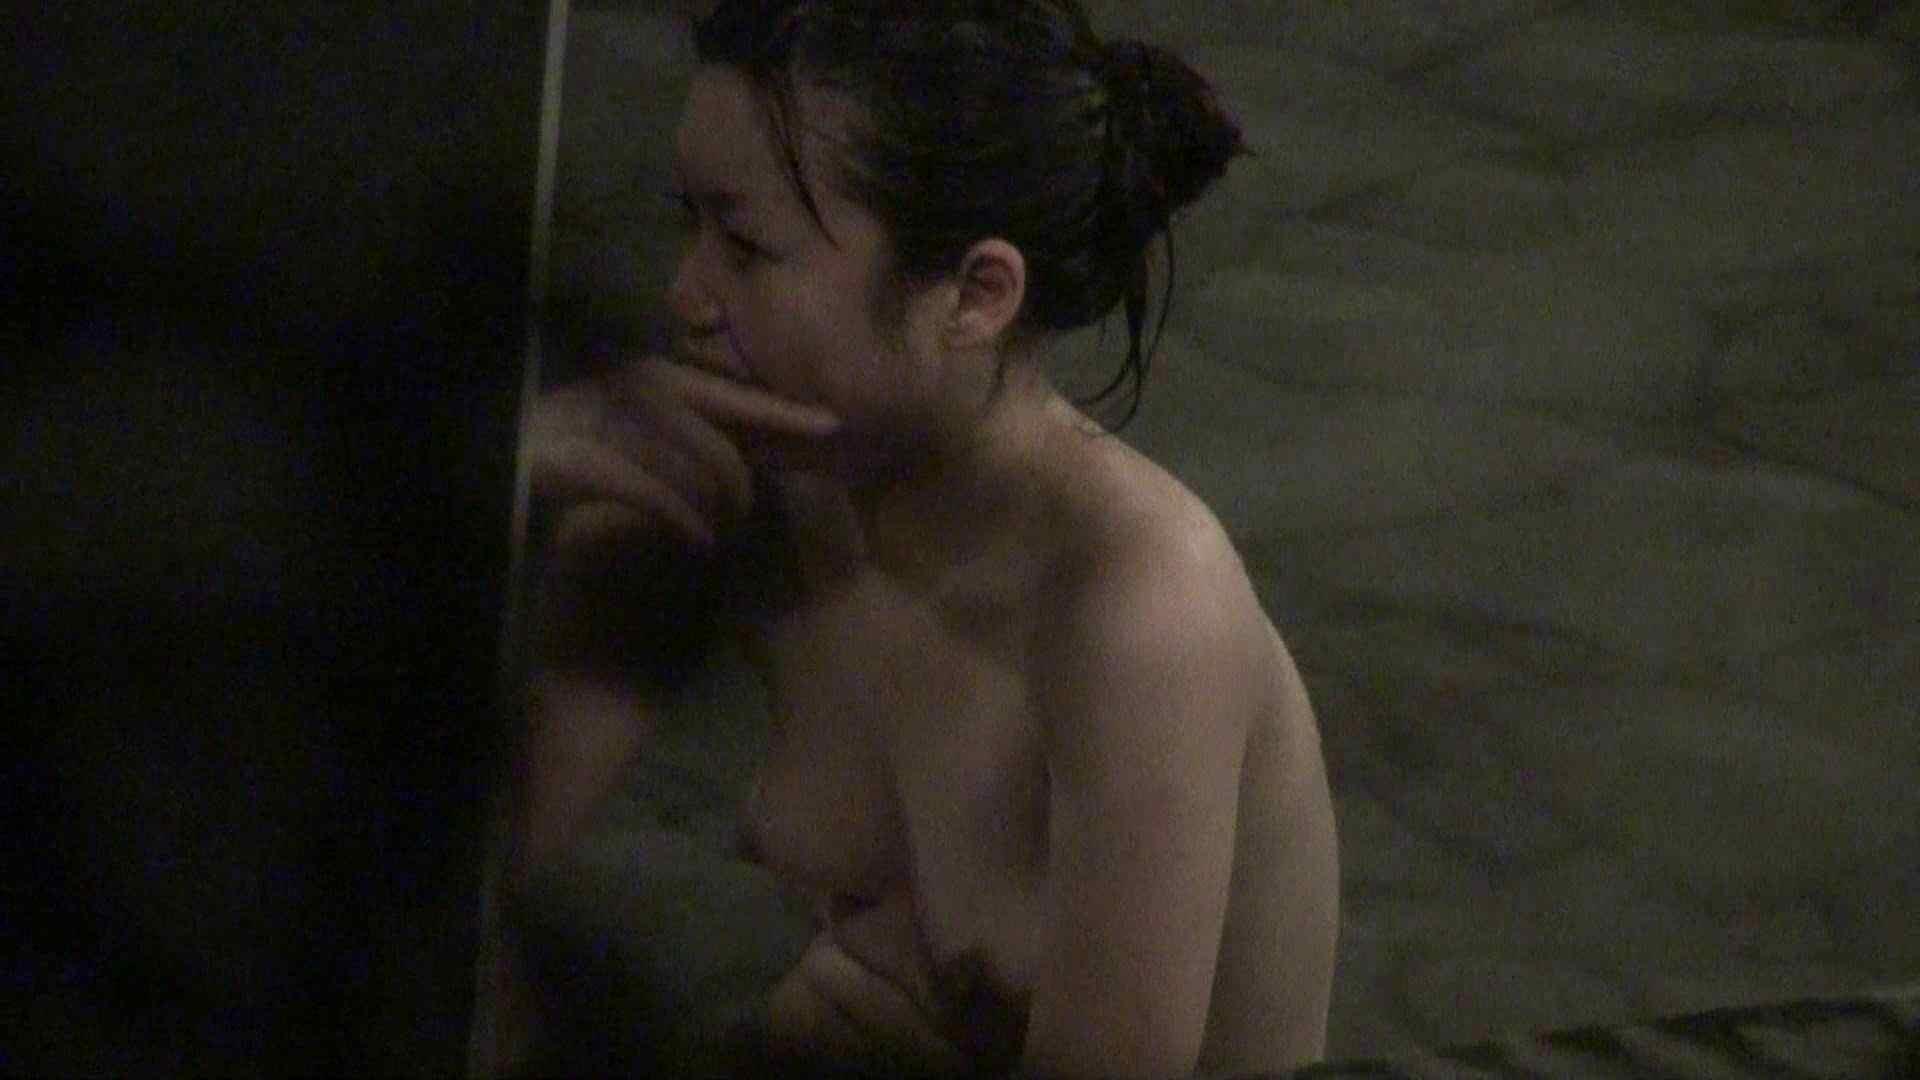 Aquaな露天風呂Vol.342 0 | 0  59連発 11